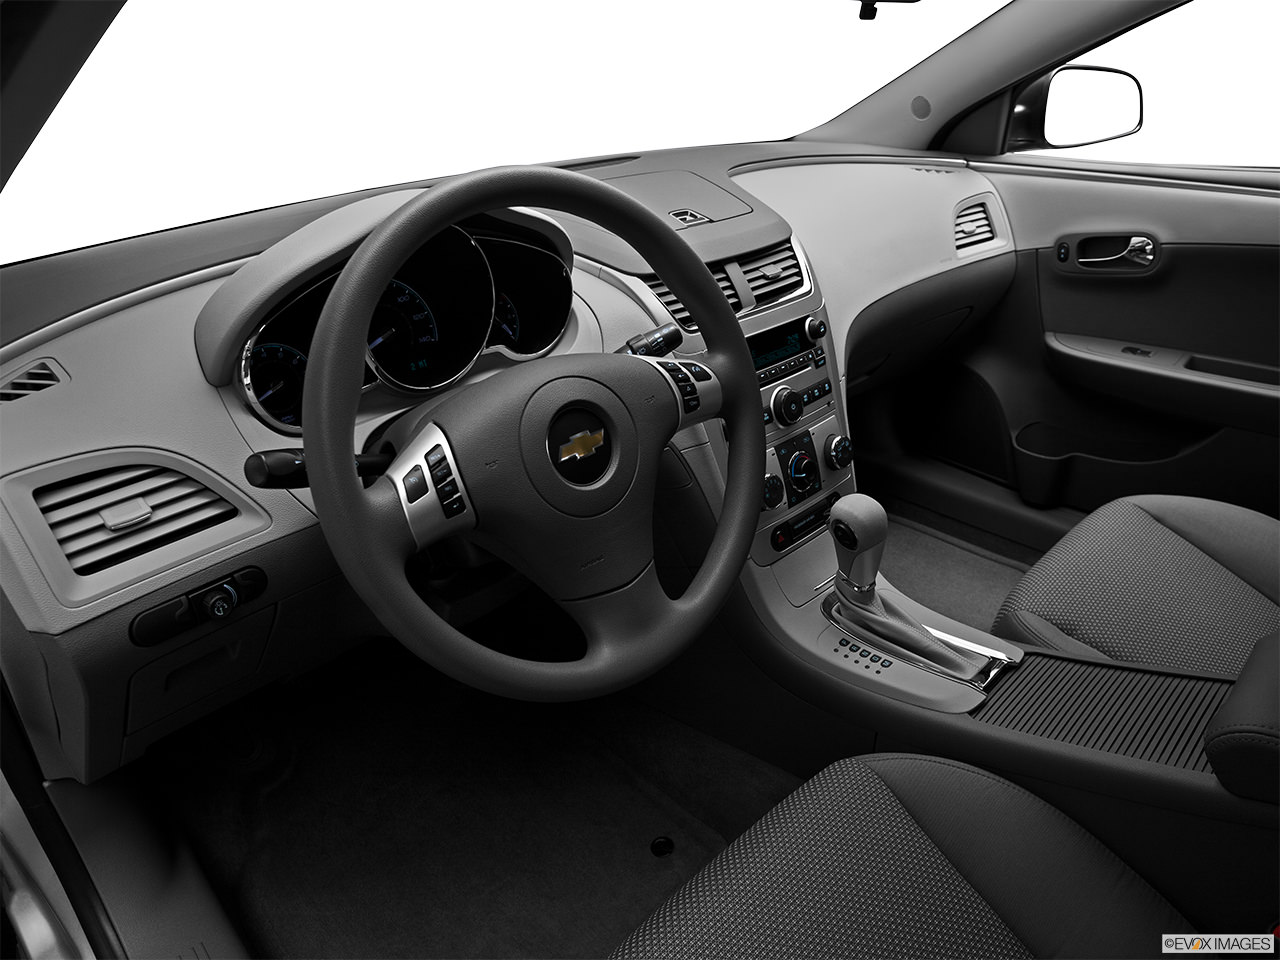 Chevrolet Malibu 2012 Interior